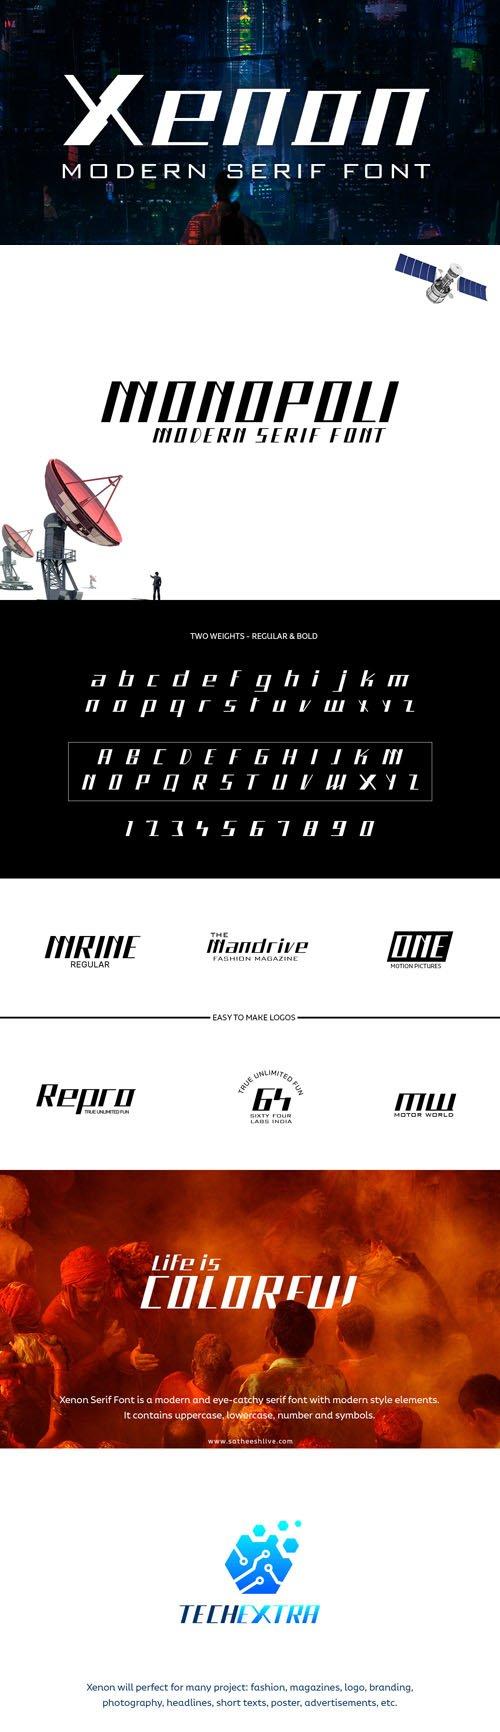 Xenon Modern Minimalist San Serif Font Family [3-Weights]